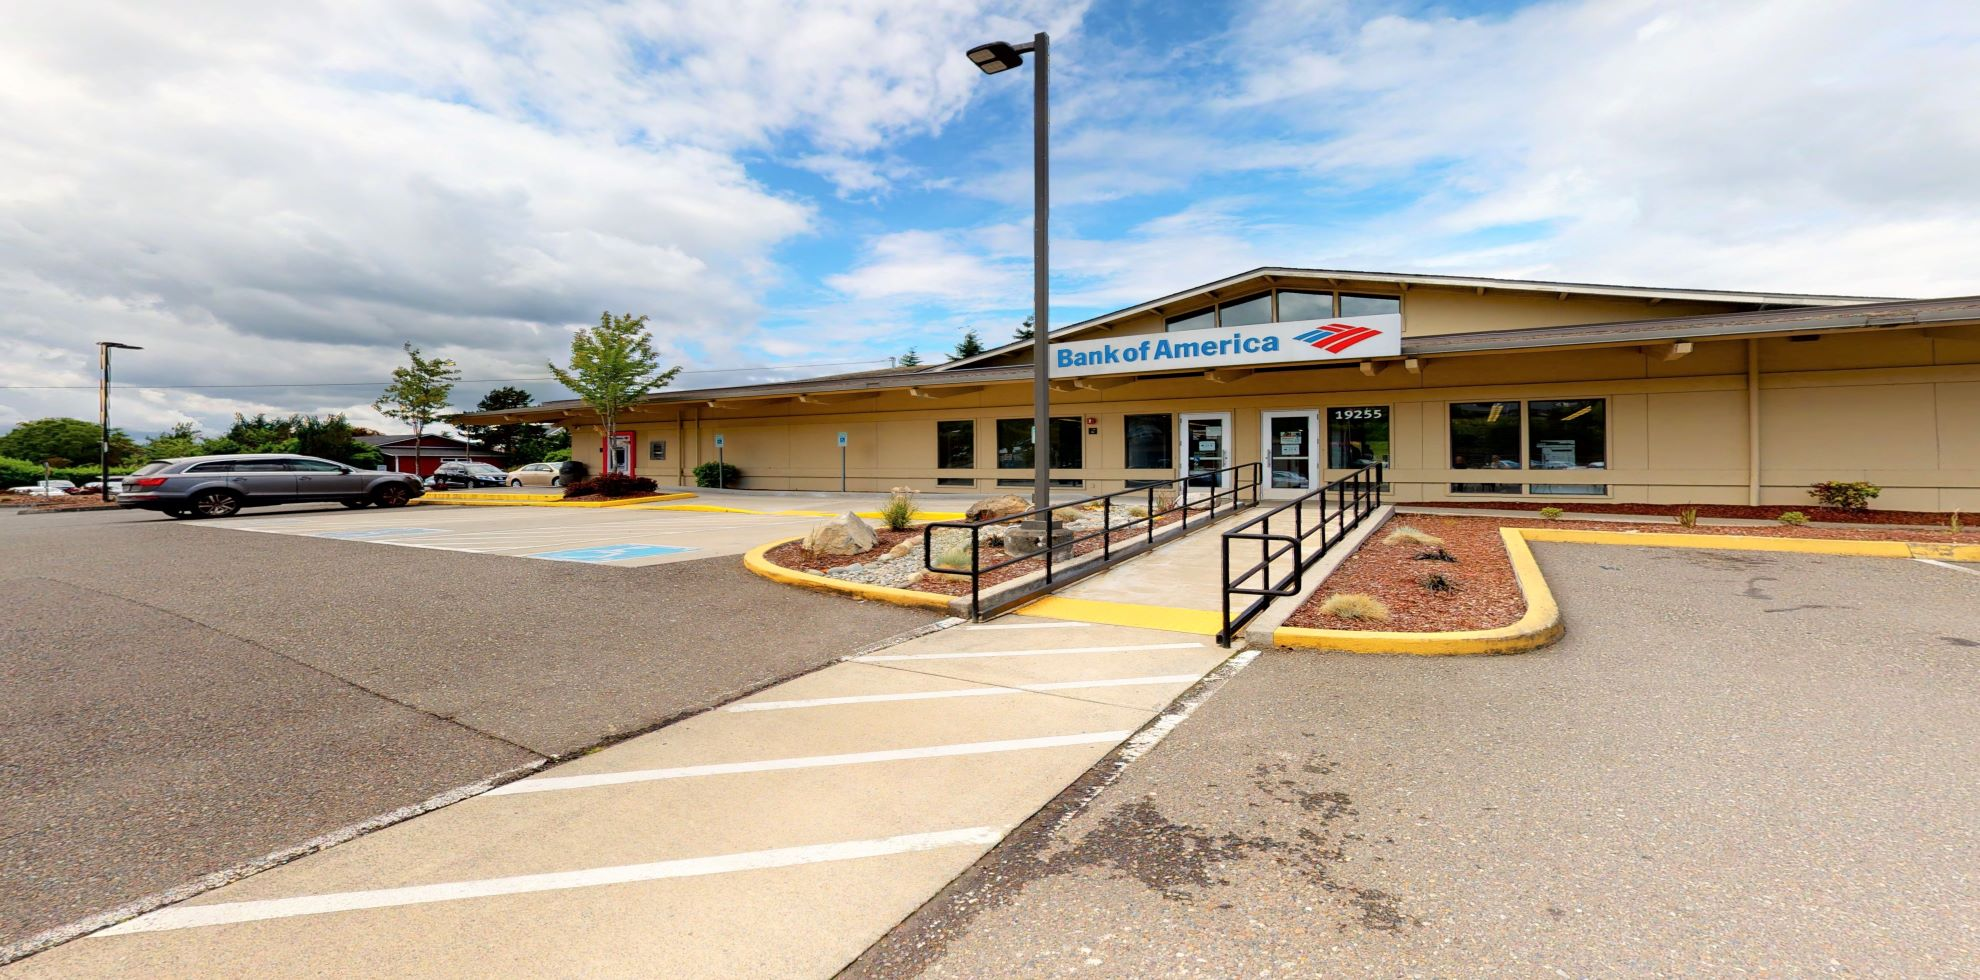 Bank of America financial center with drive-thru ATM | 19255 Jensen Way NE, Poulsbo, WA 98370